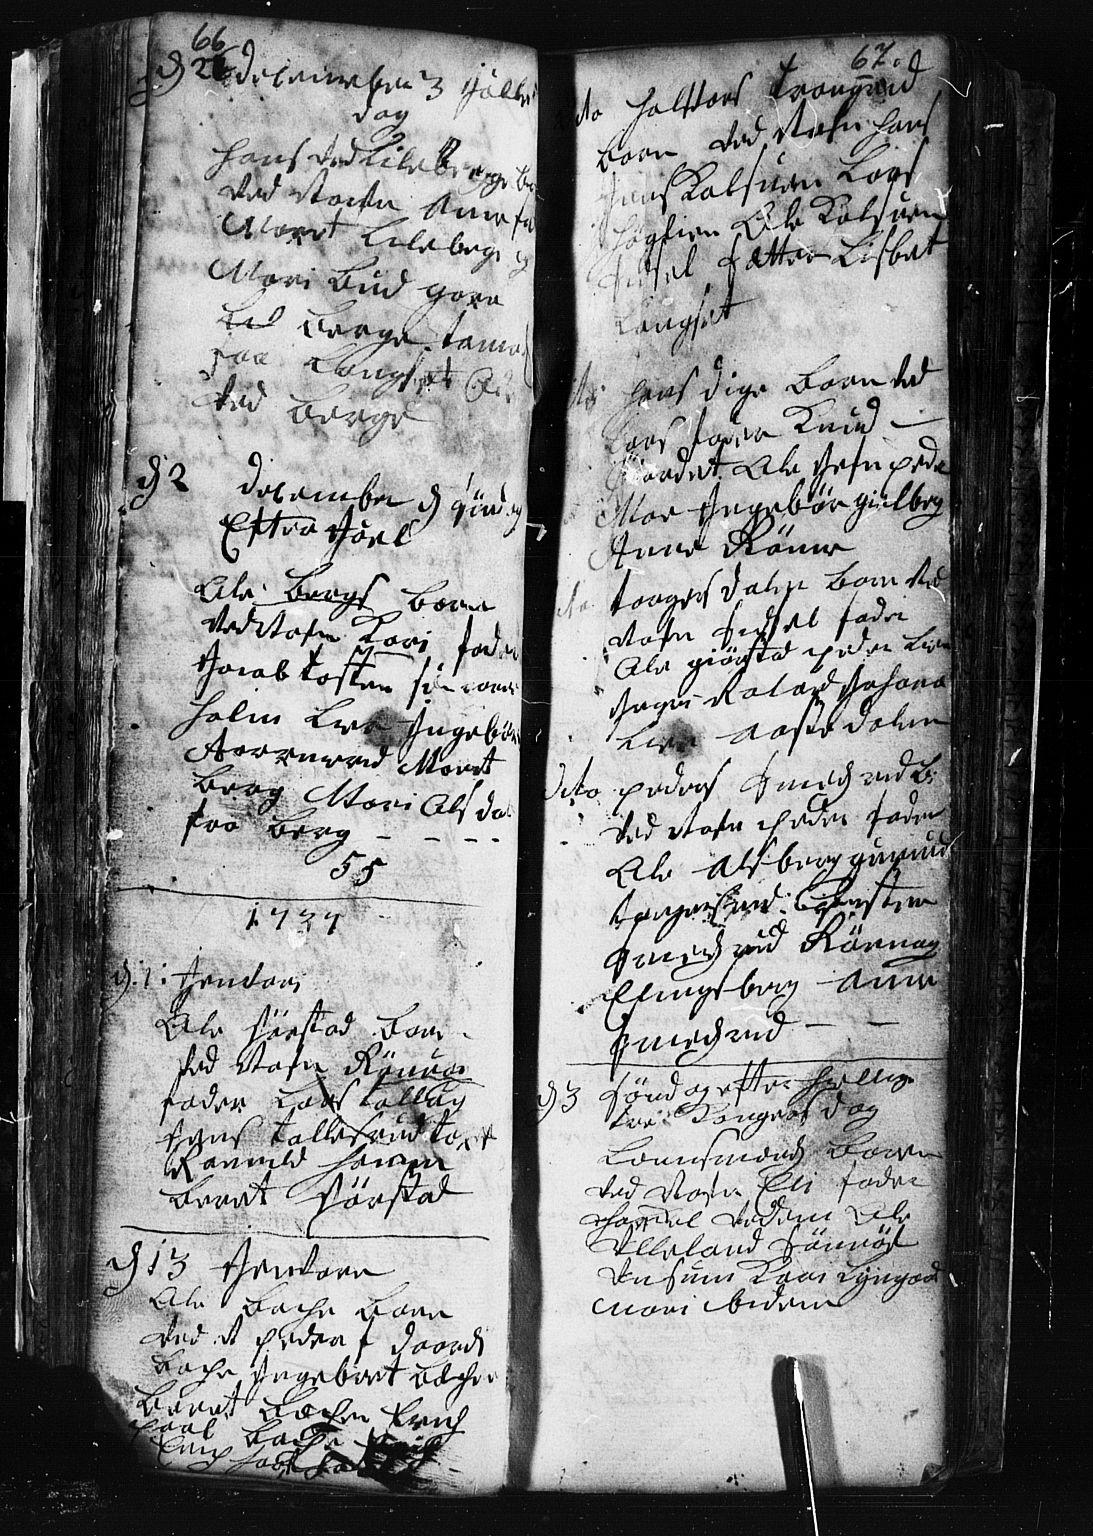 SAH, Fåberg prestekontor, Klokkerbok nr. 1, 1727-1767, s. 66-67